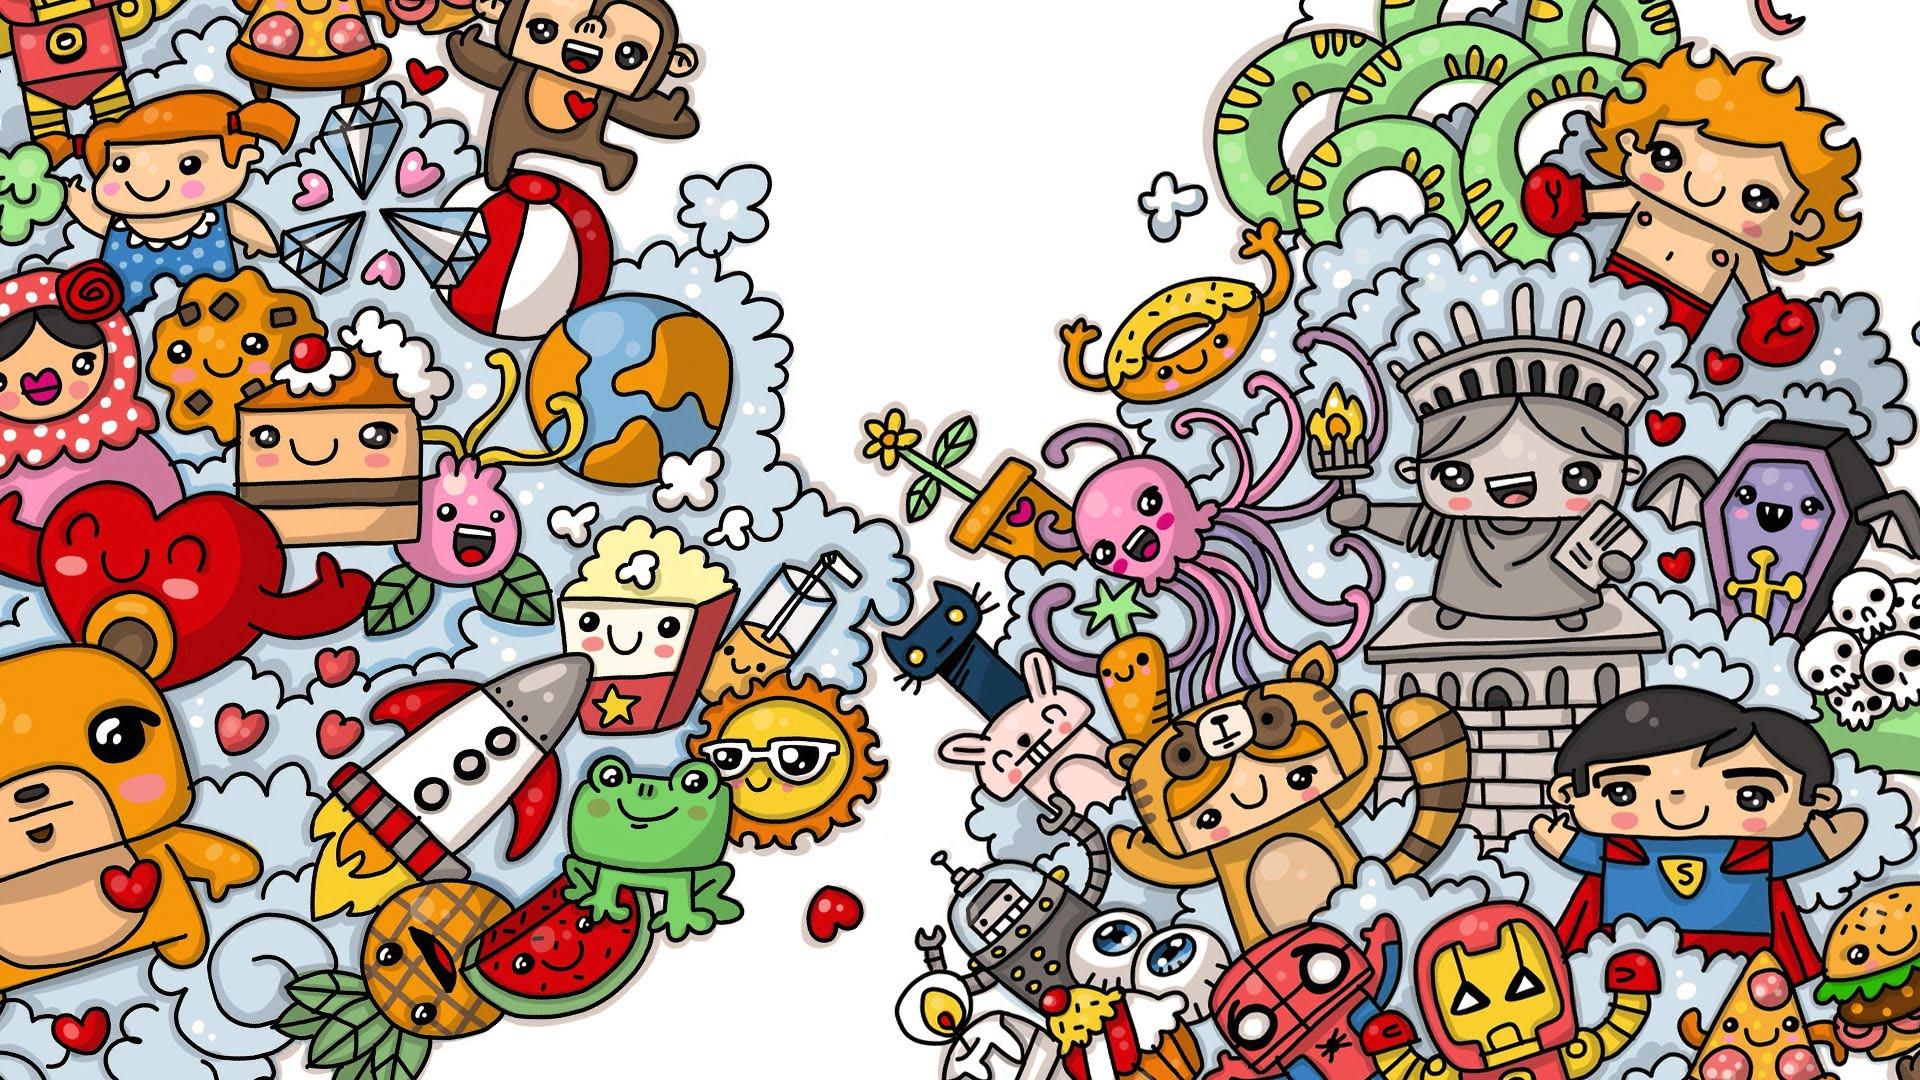 Cute Kc Name Laptop Wallpaper Doodle Art Wallpapers 52 Images